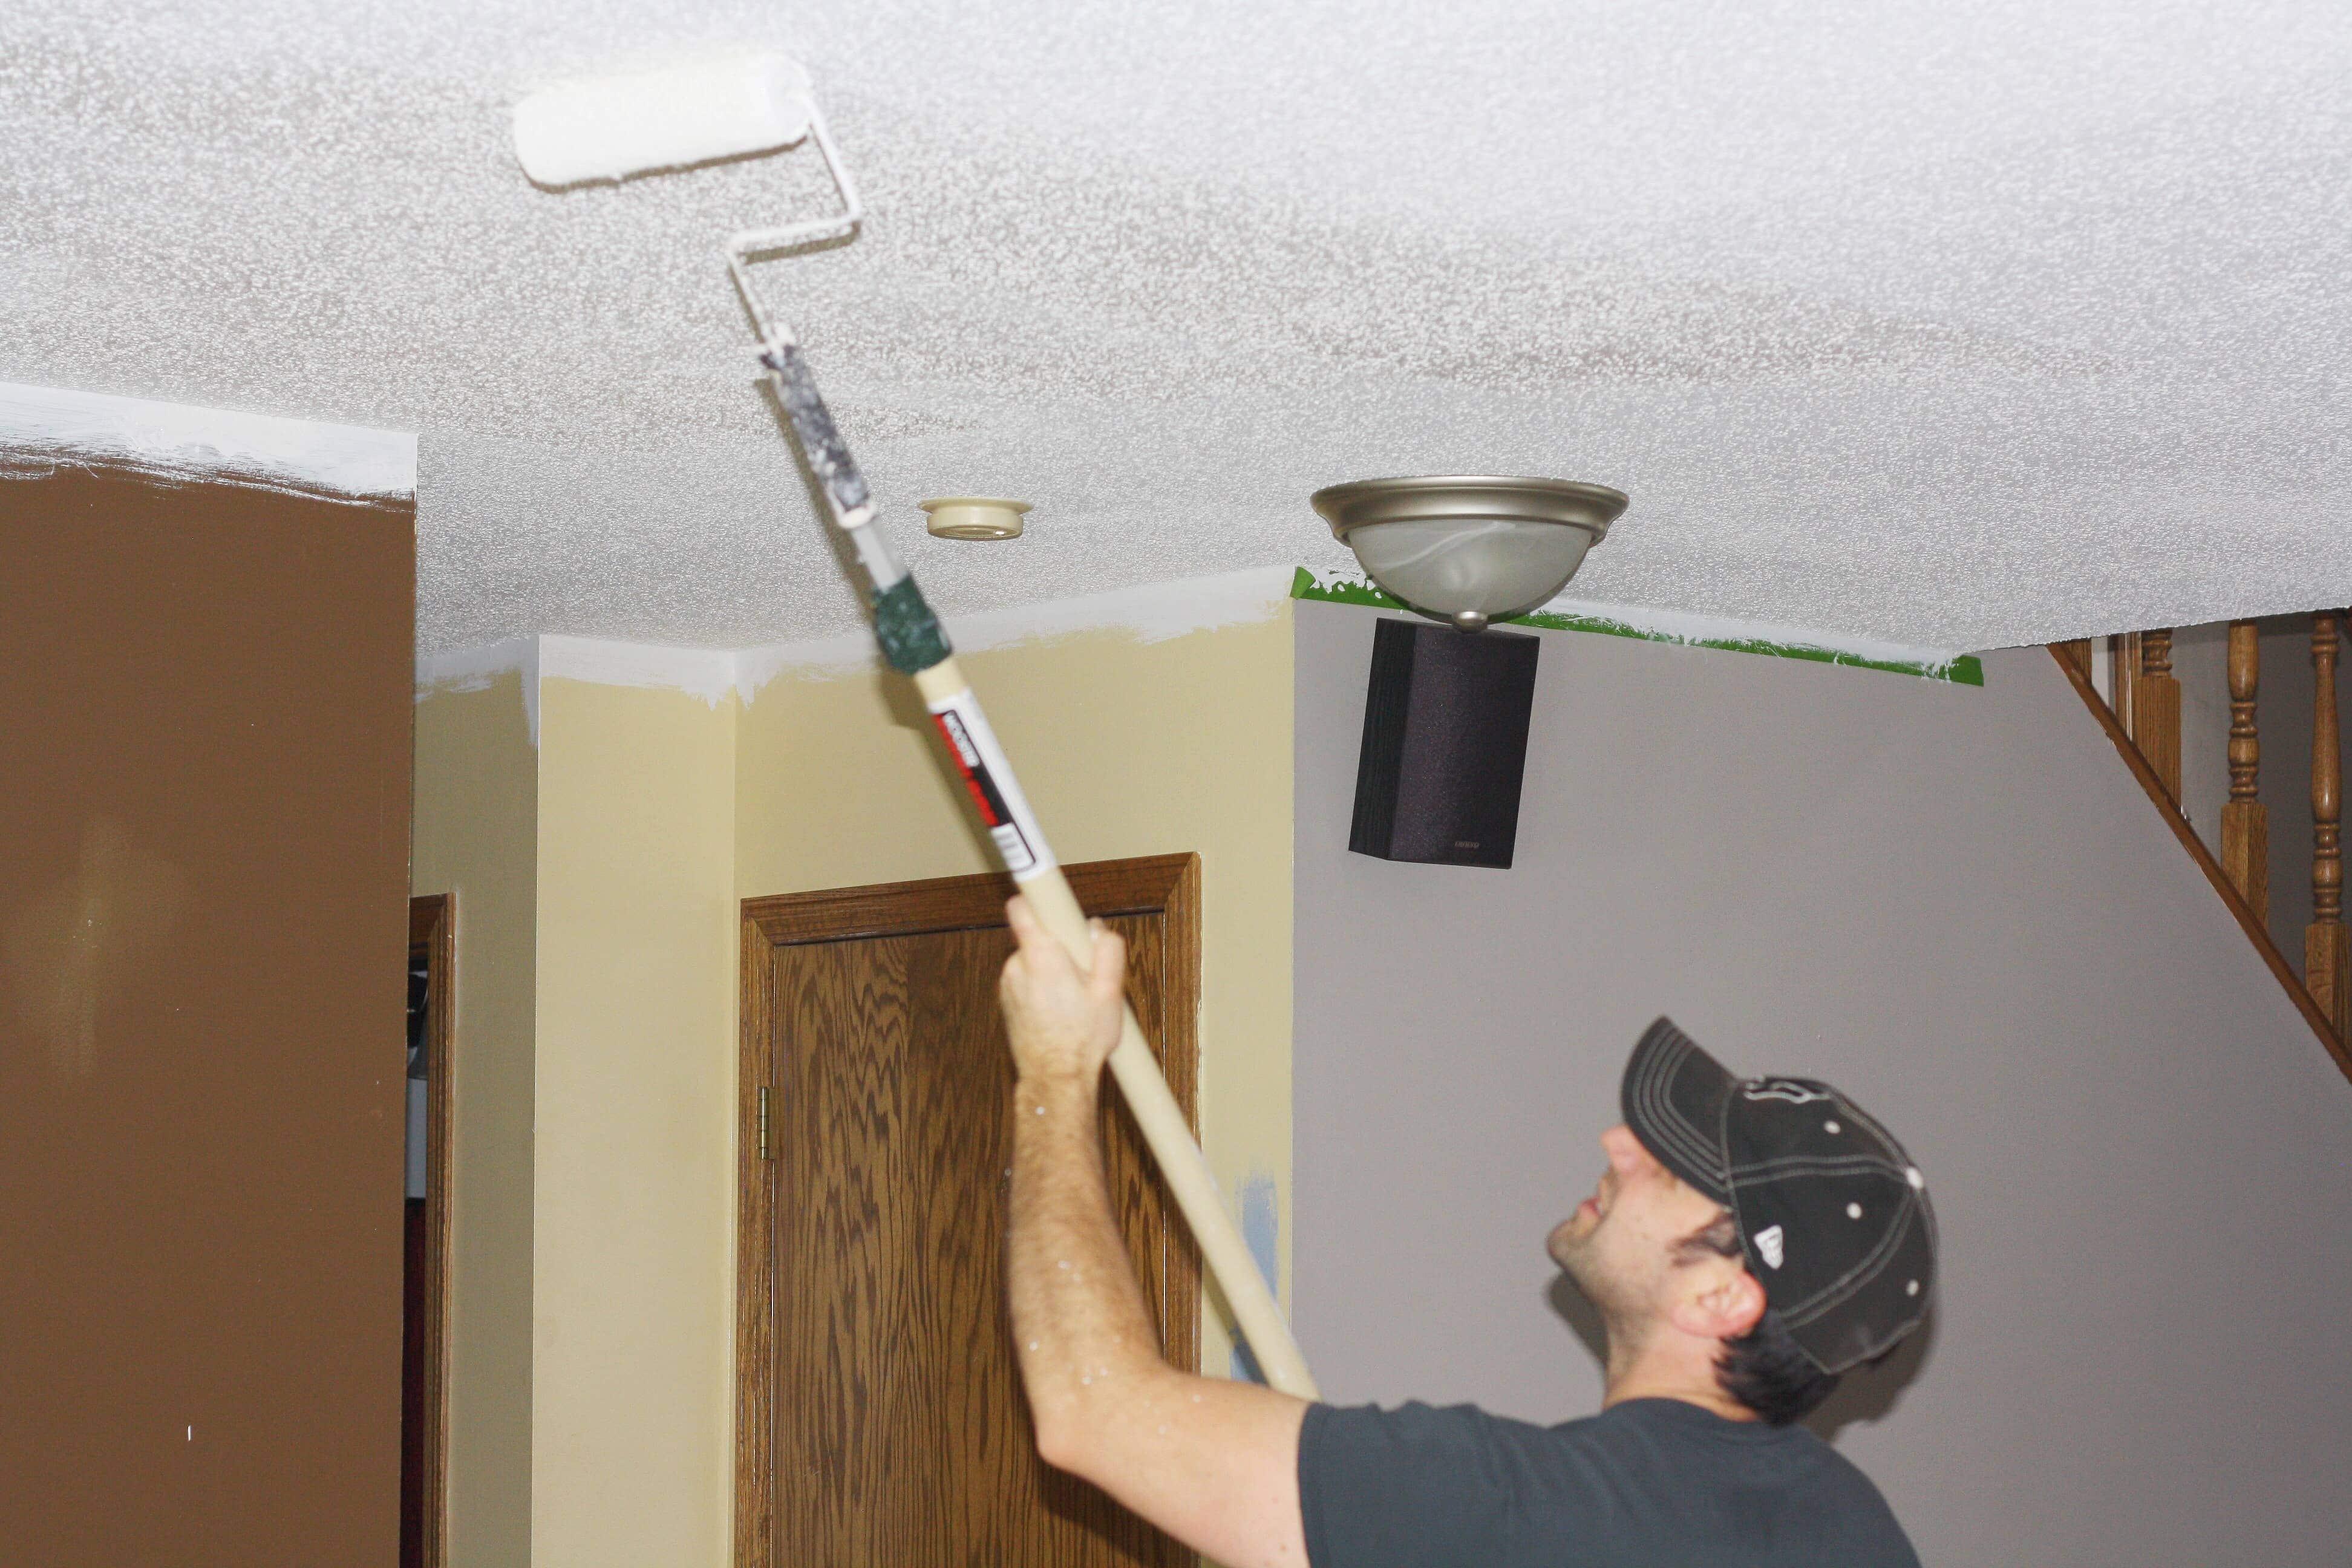 How To Paint Popcorn Ceiling Refashionablylate Com